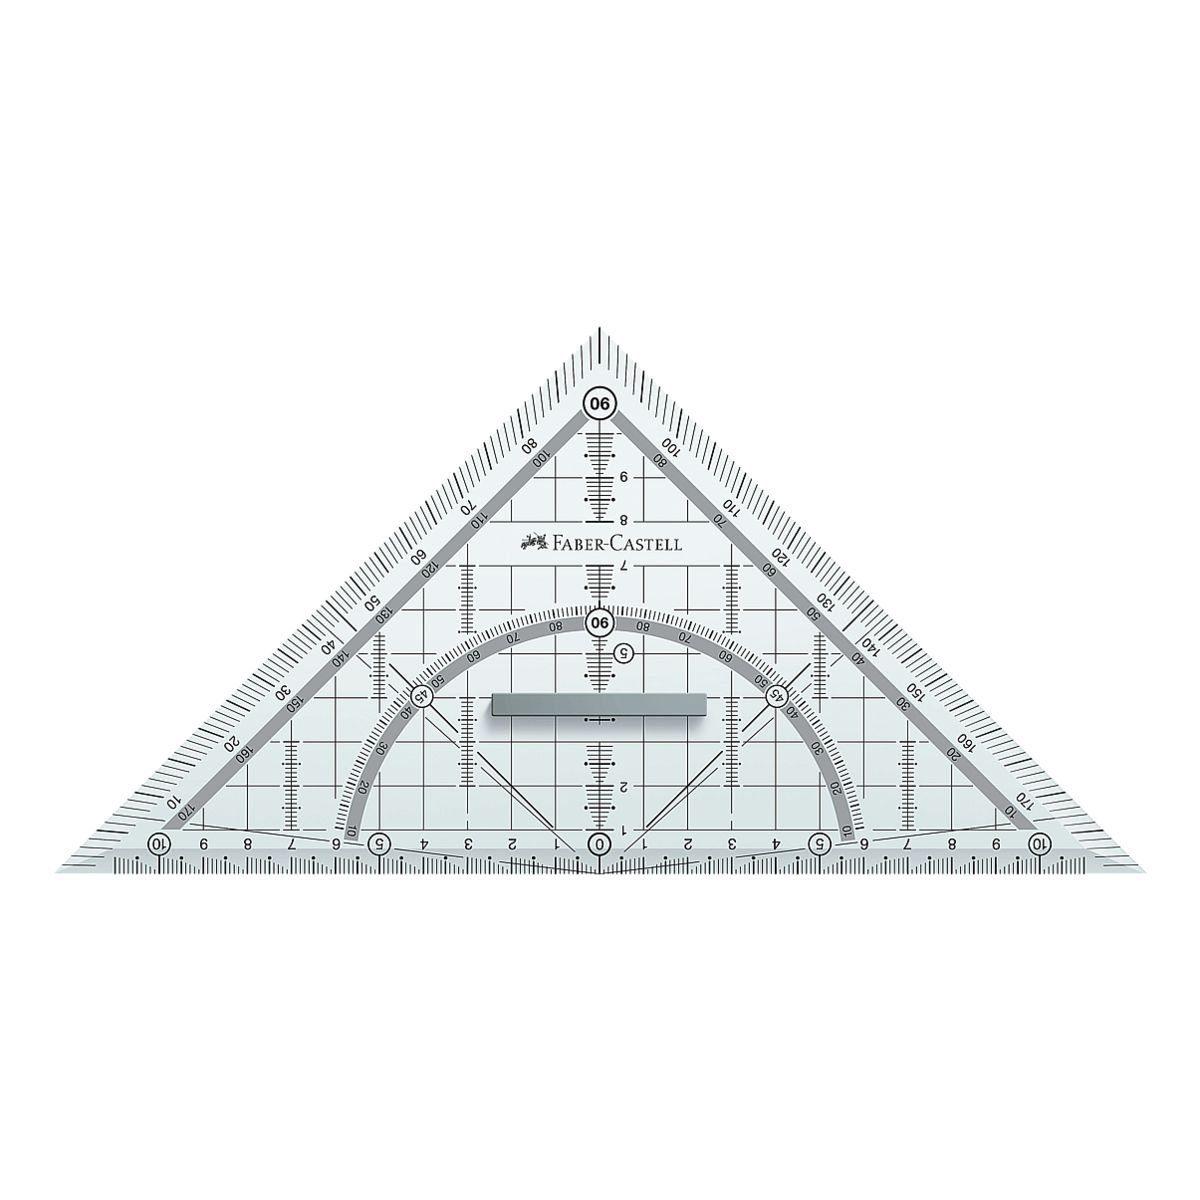 Faber-Castell Geometriedreieck 22 cm mit Griff